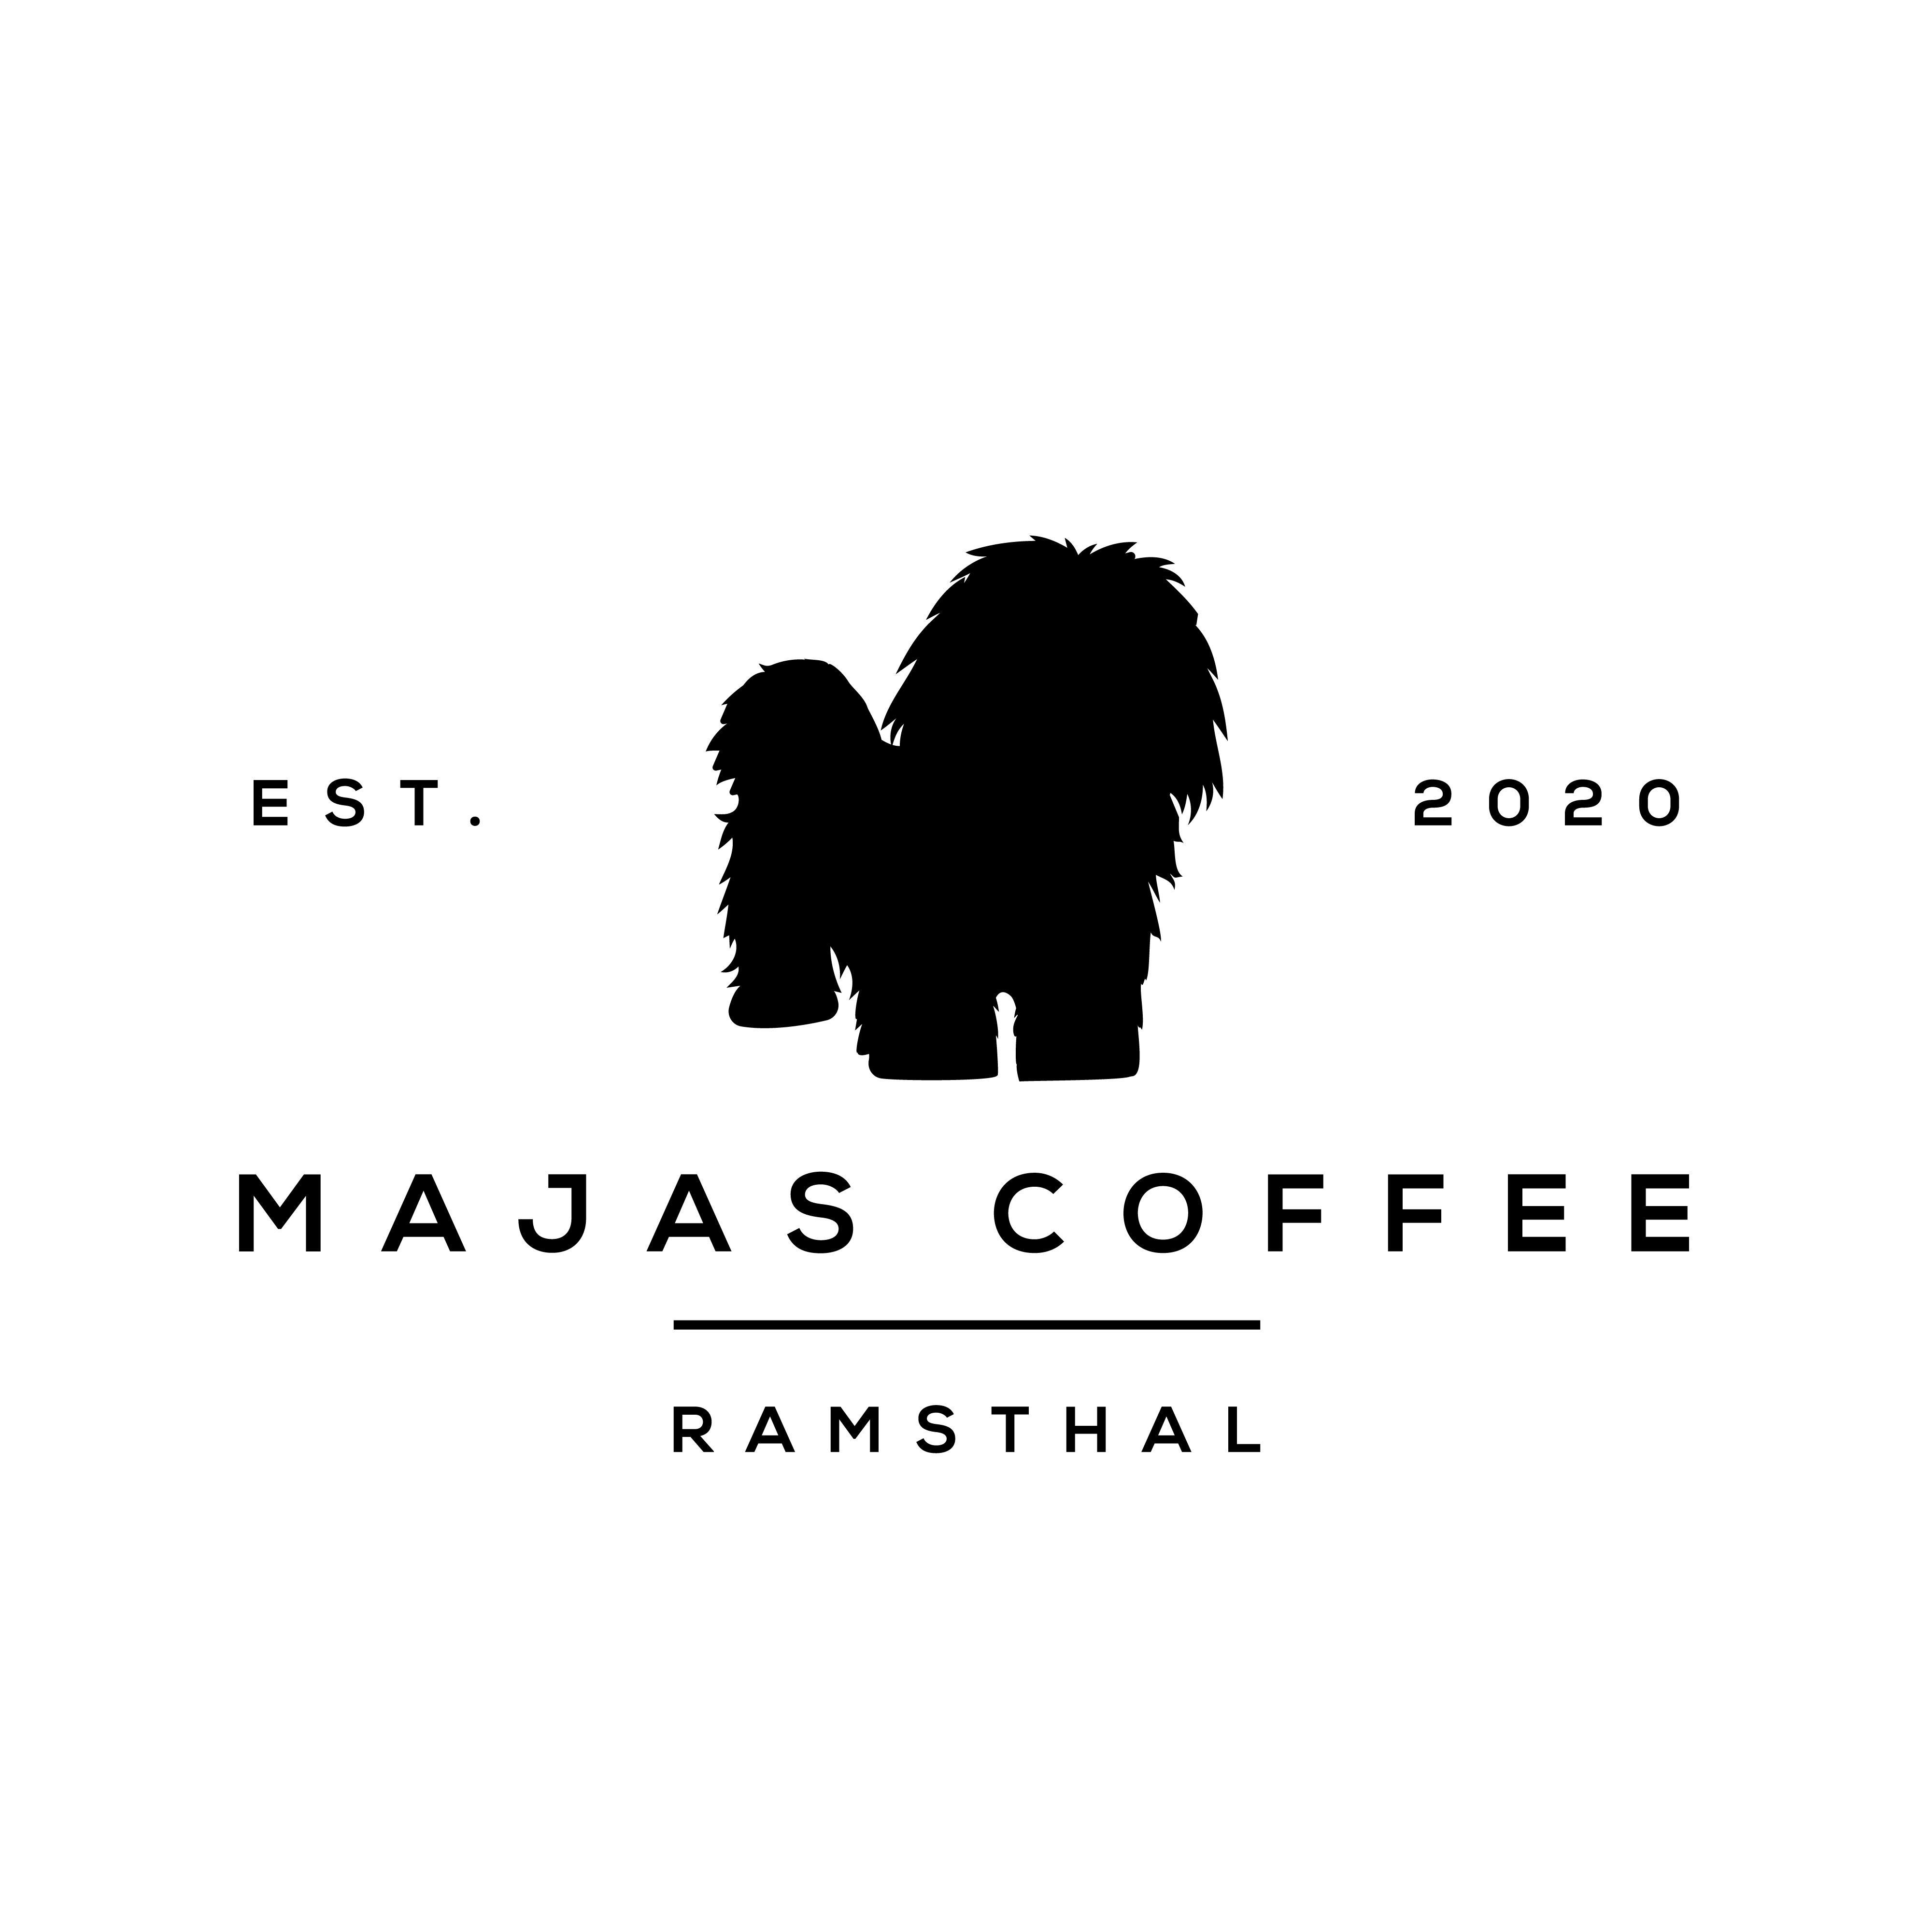 Majas Coffee Ramsthal